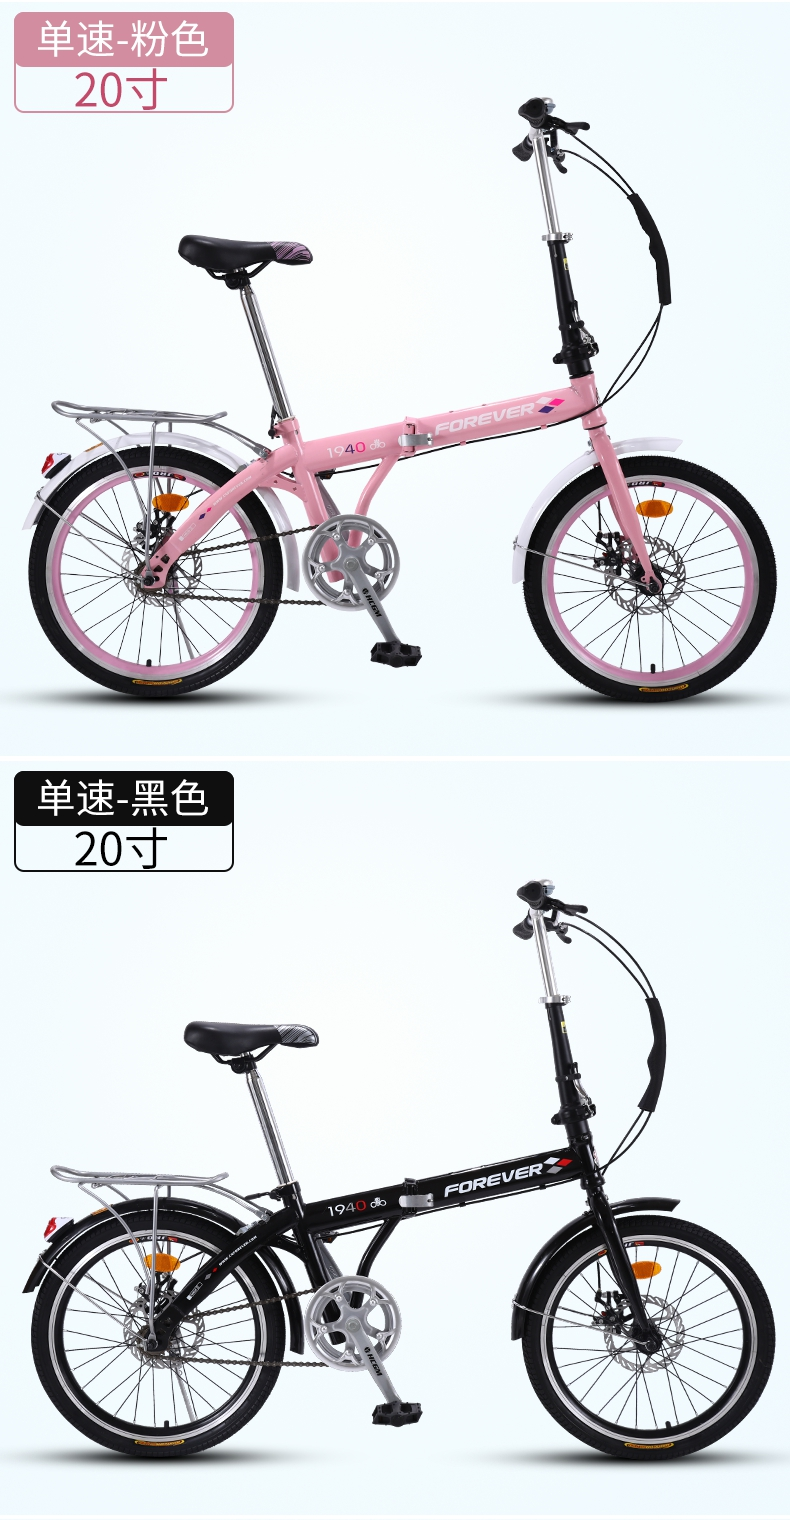 Hf4a0a659e71a4703a3d2af9261e08955p 20 inch Mountain bike off-road male female wheel folding bicycle dual disc brakes variable mountain bike bicycles road bike